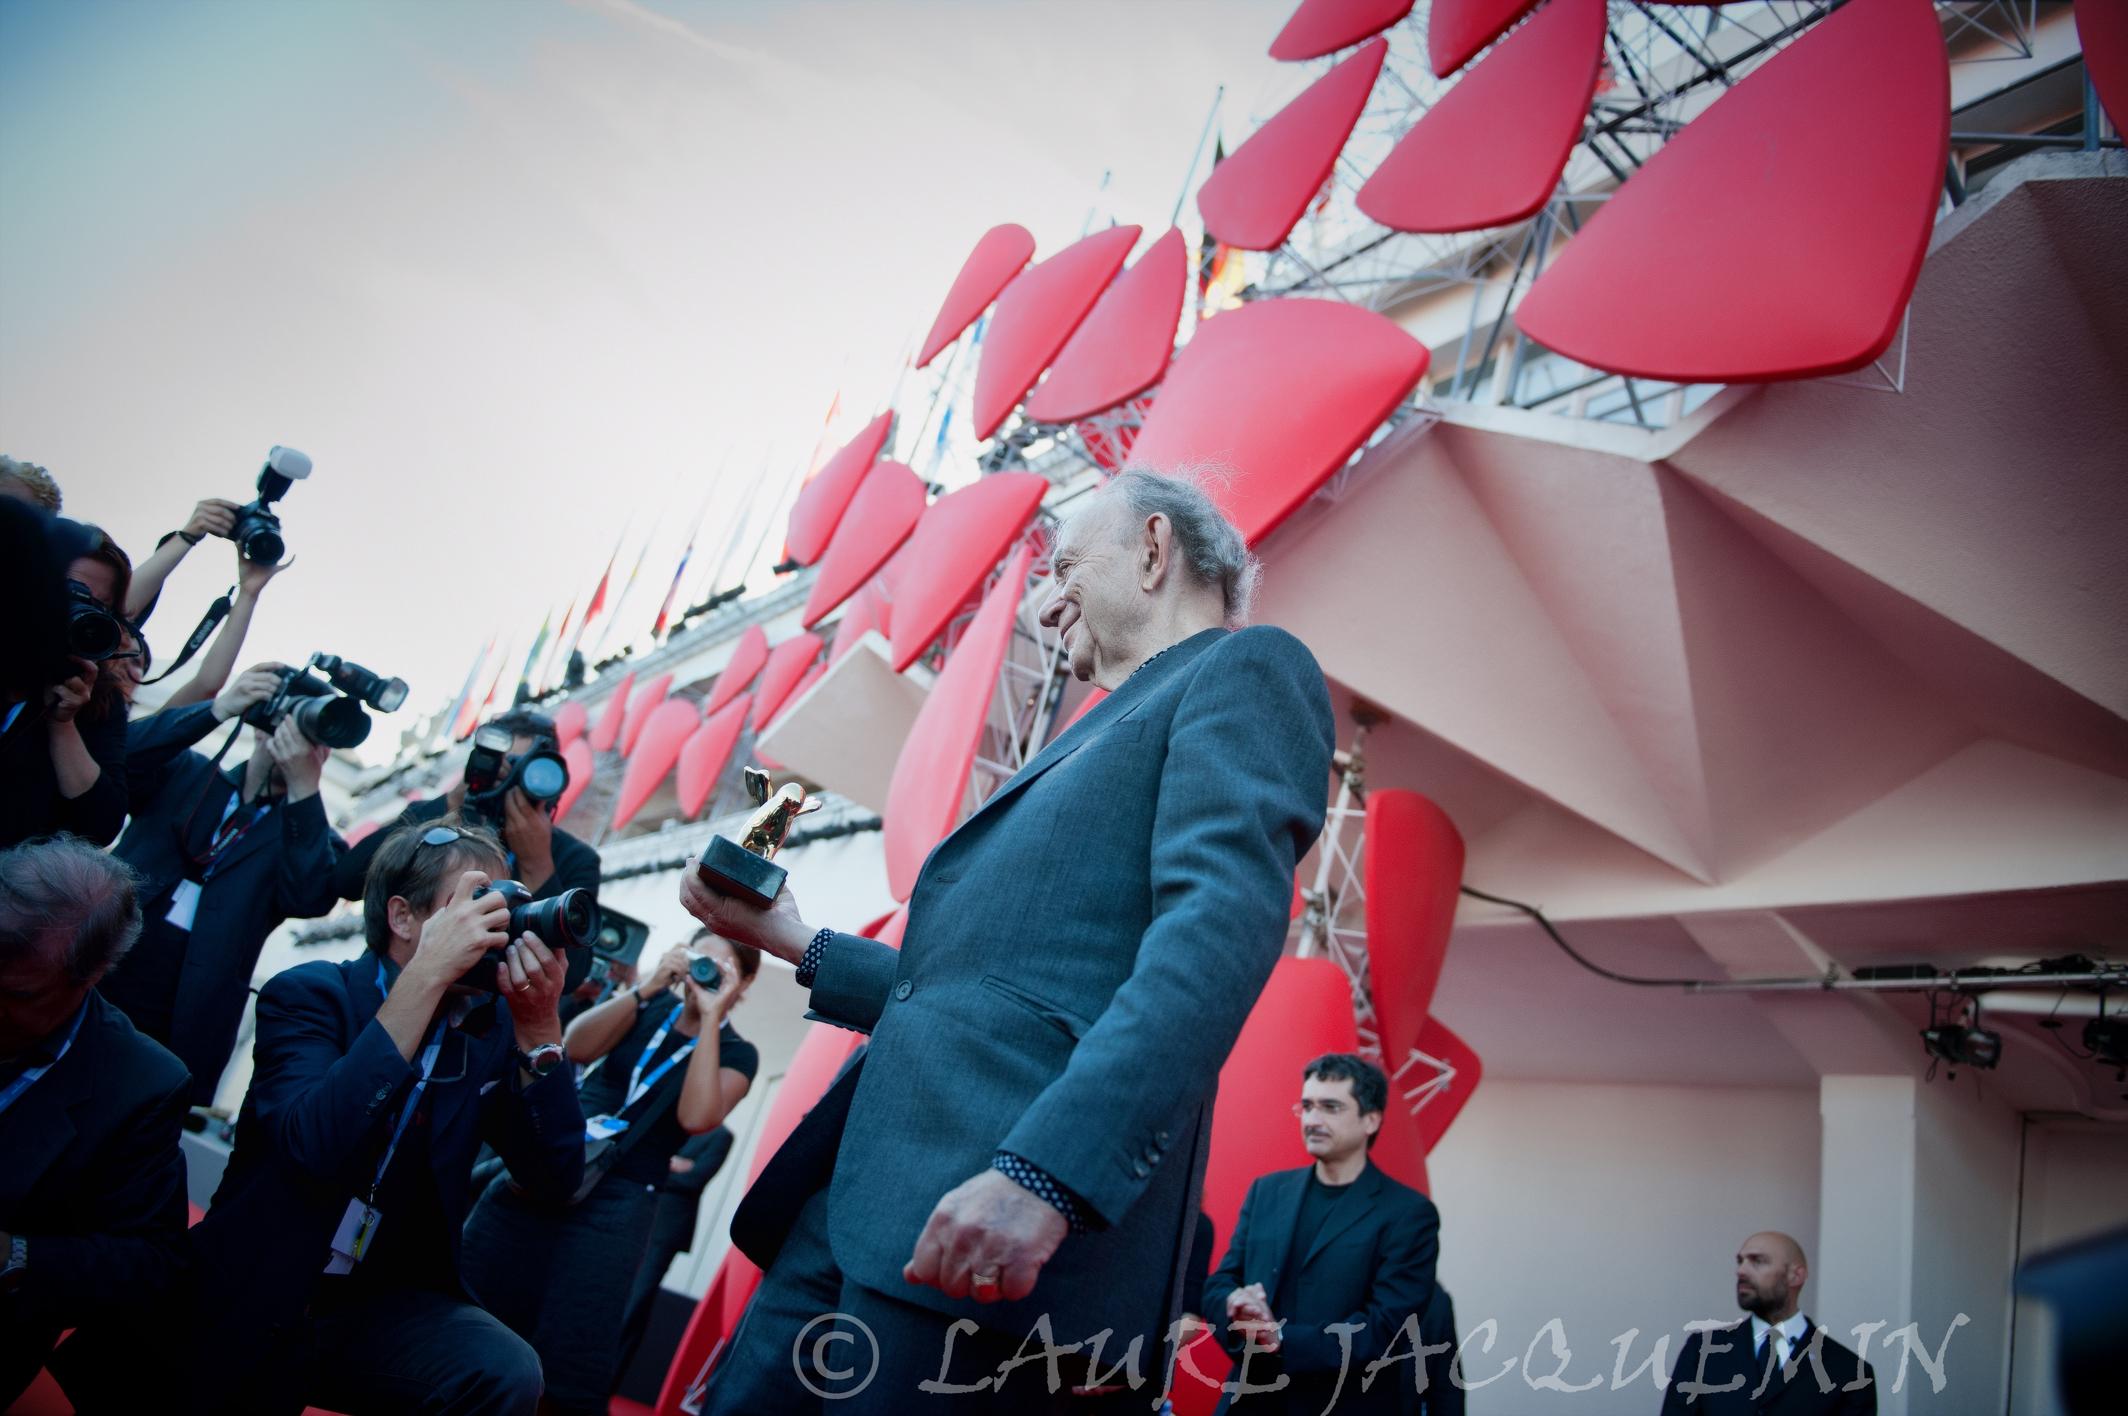 venice film festival venice laure jacquemin (2).jpg